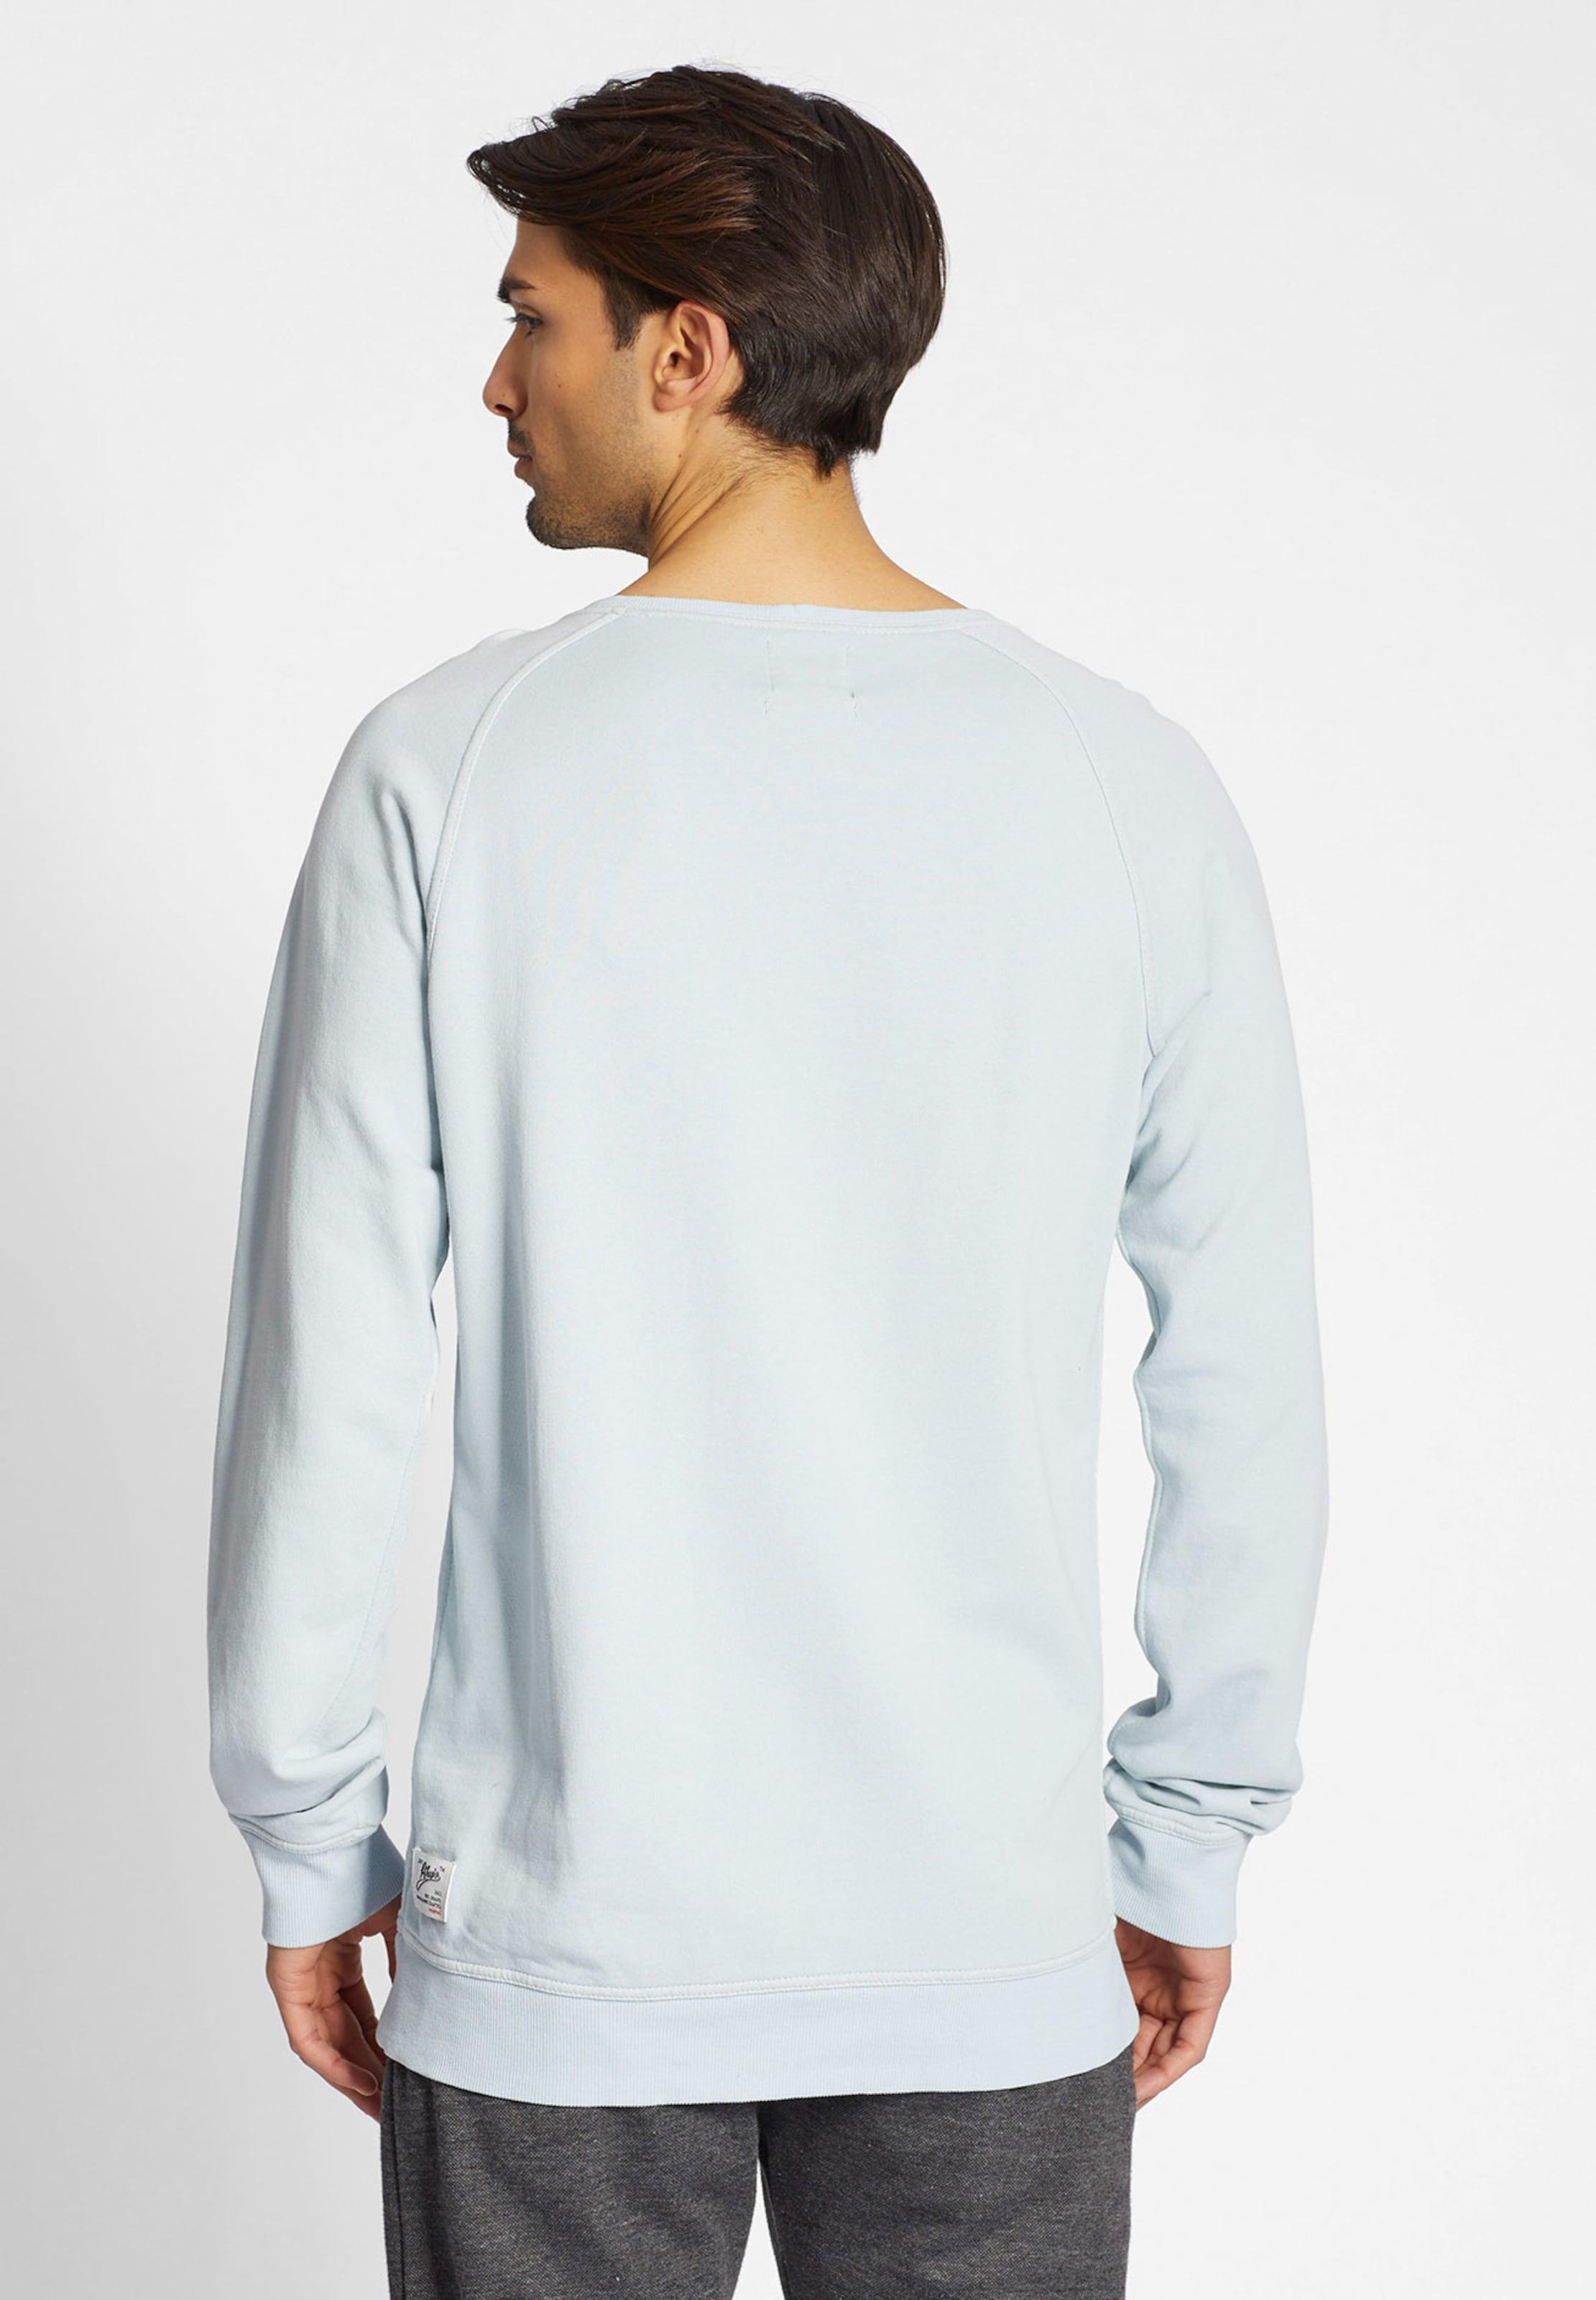 Fumé Bleu En 'worth' Sweat Khujo shirt rhtCdsQx